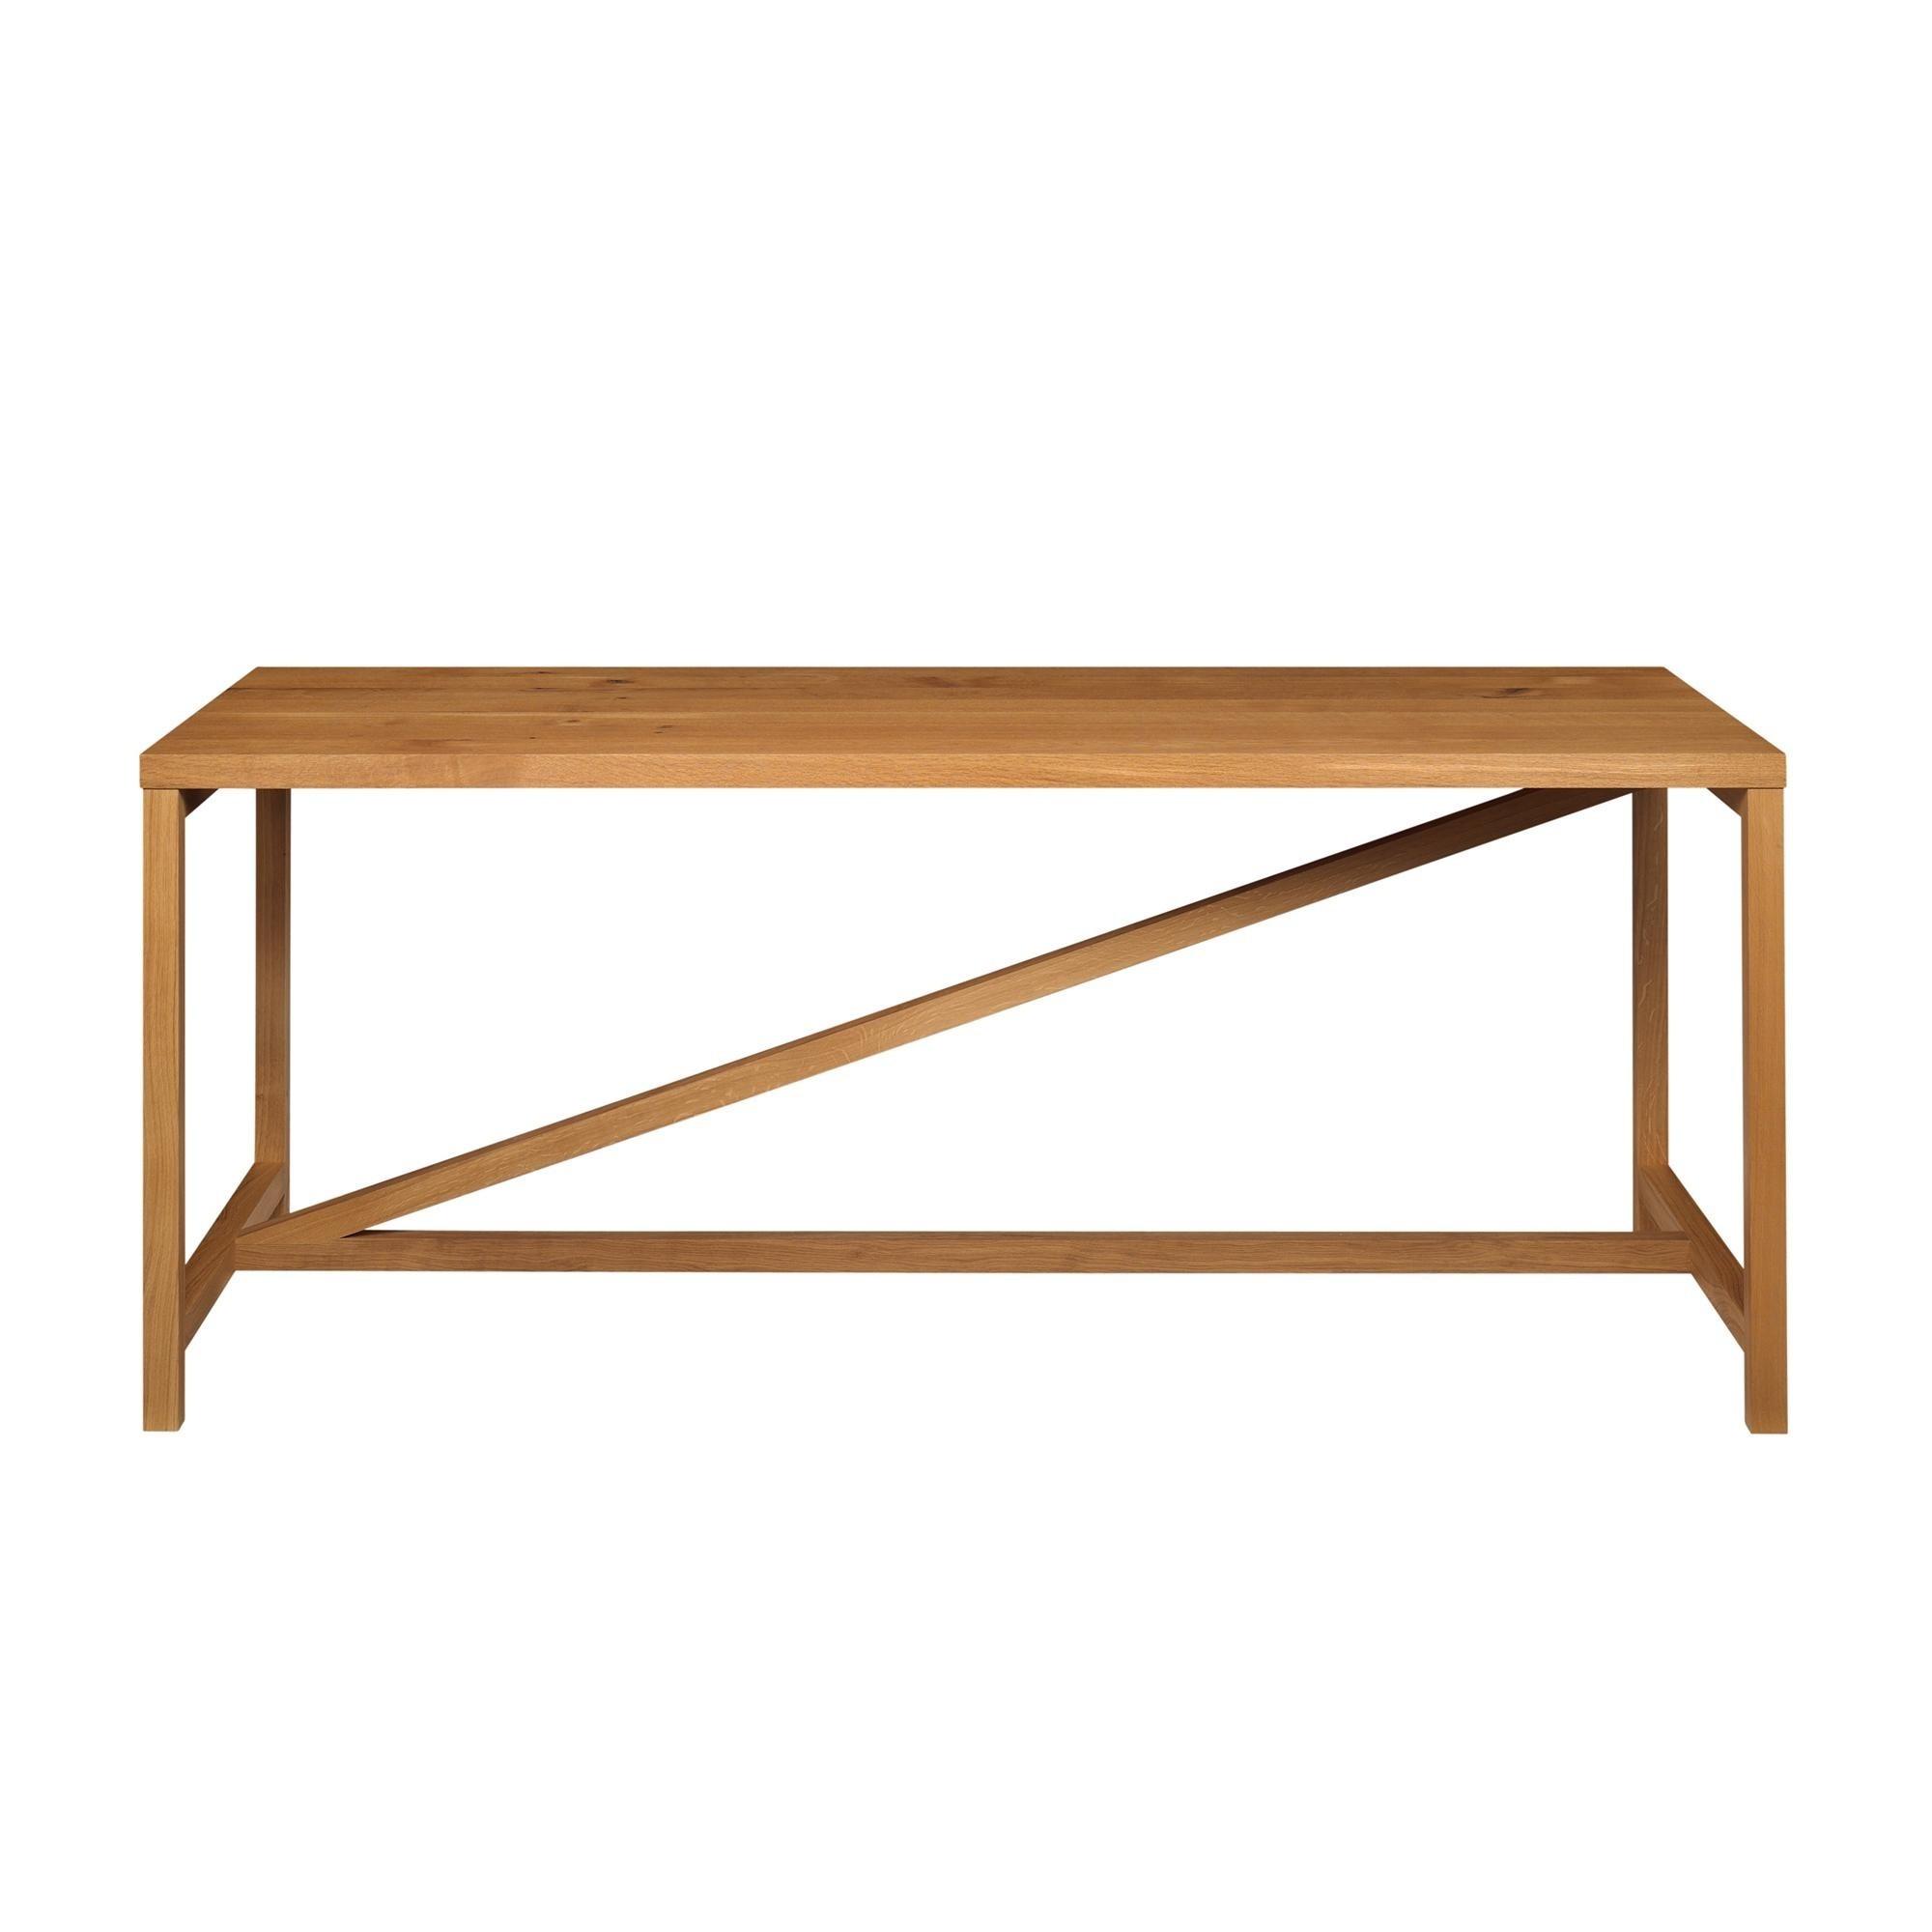 e15 ta21 platz dining table h 90cm ambientedirect rh ambientedirect com